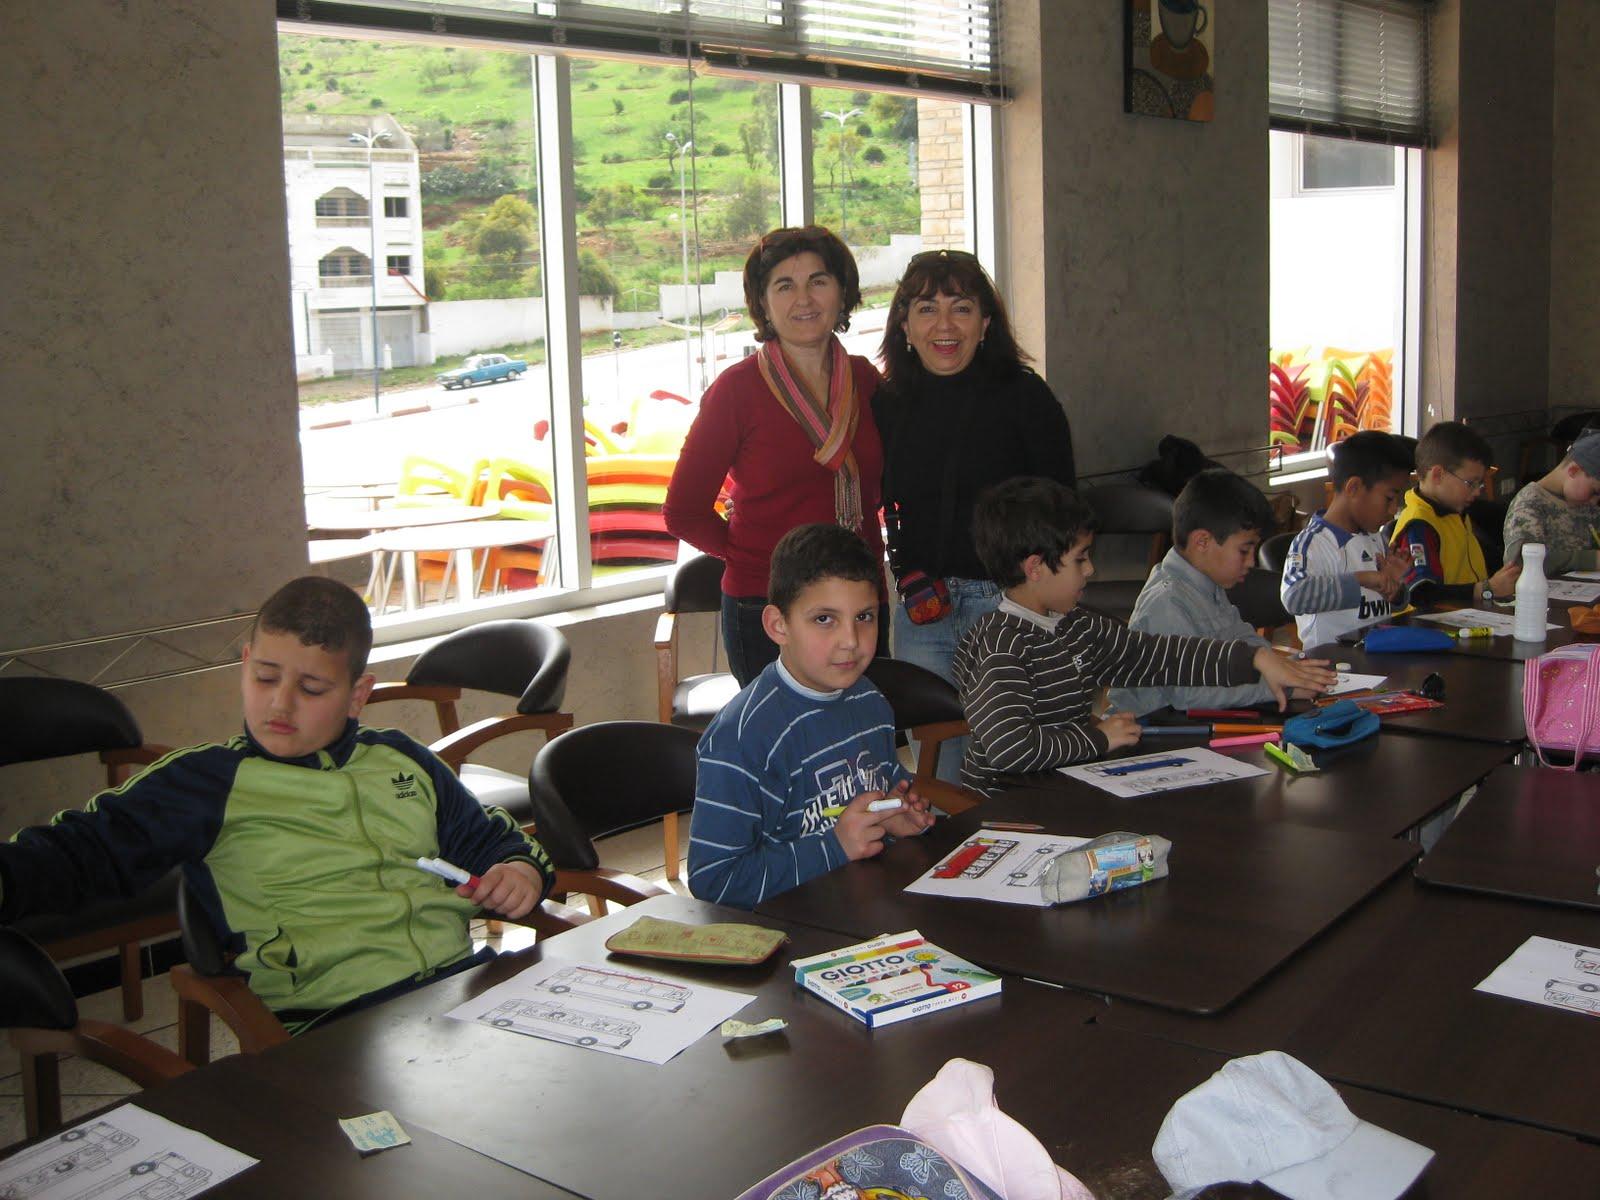 Ie melchor de jovellanos alhucemas aaee visita a la for Educacion exterior marruecos